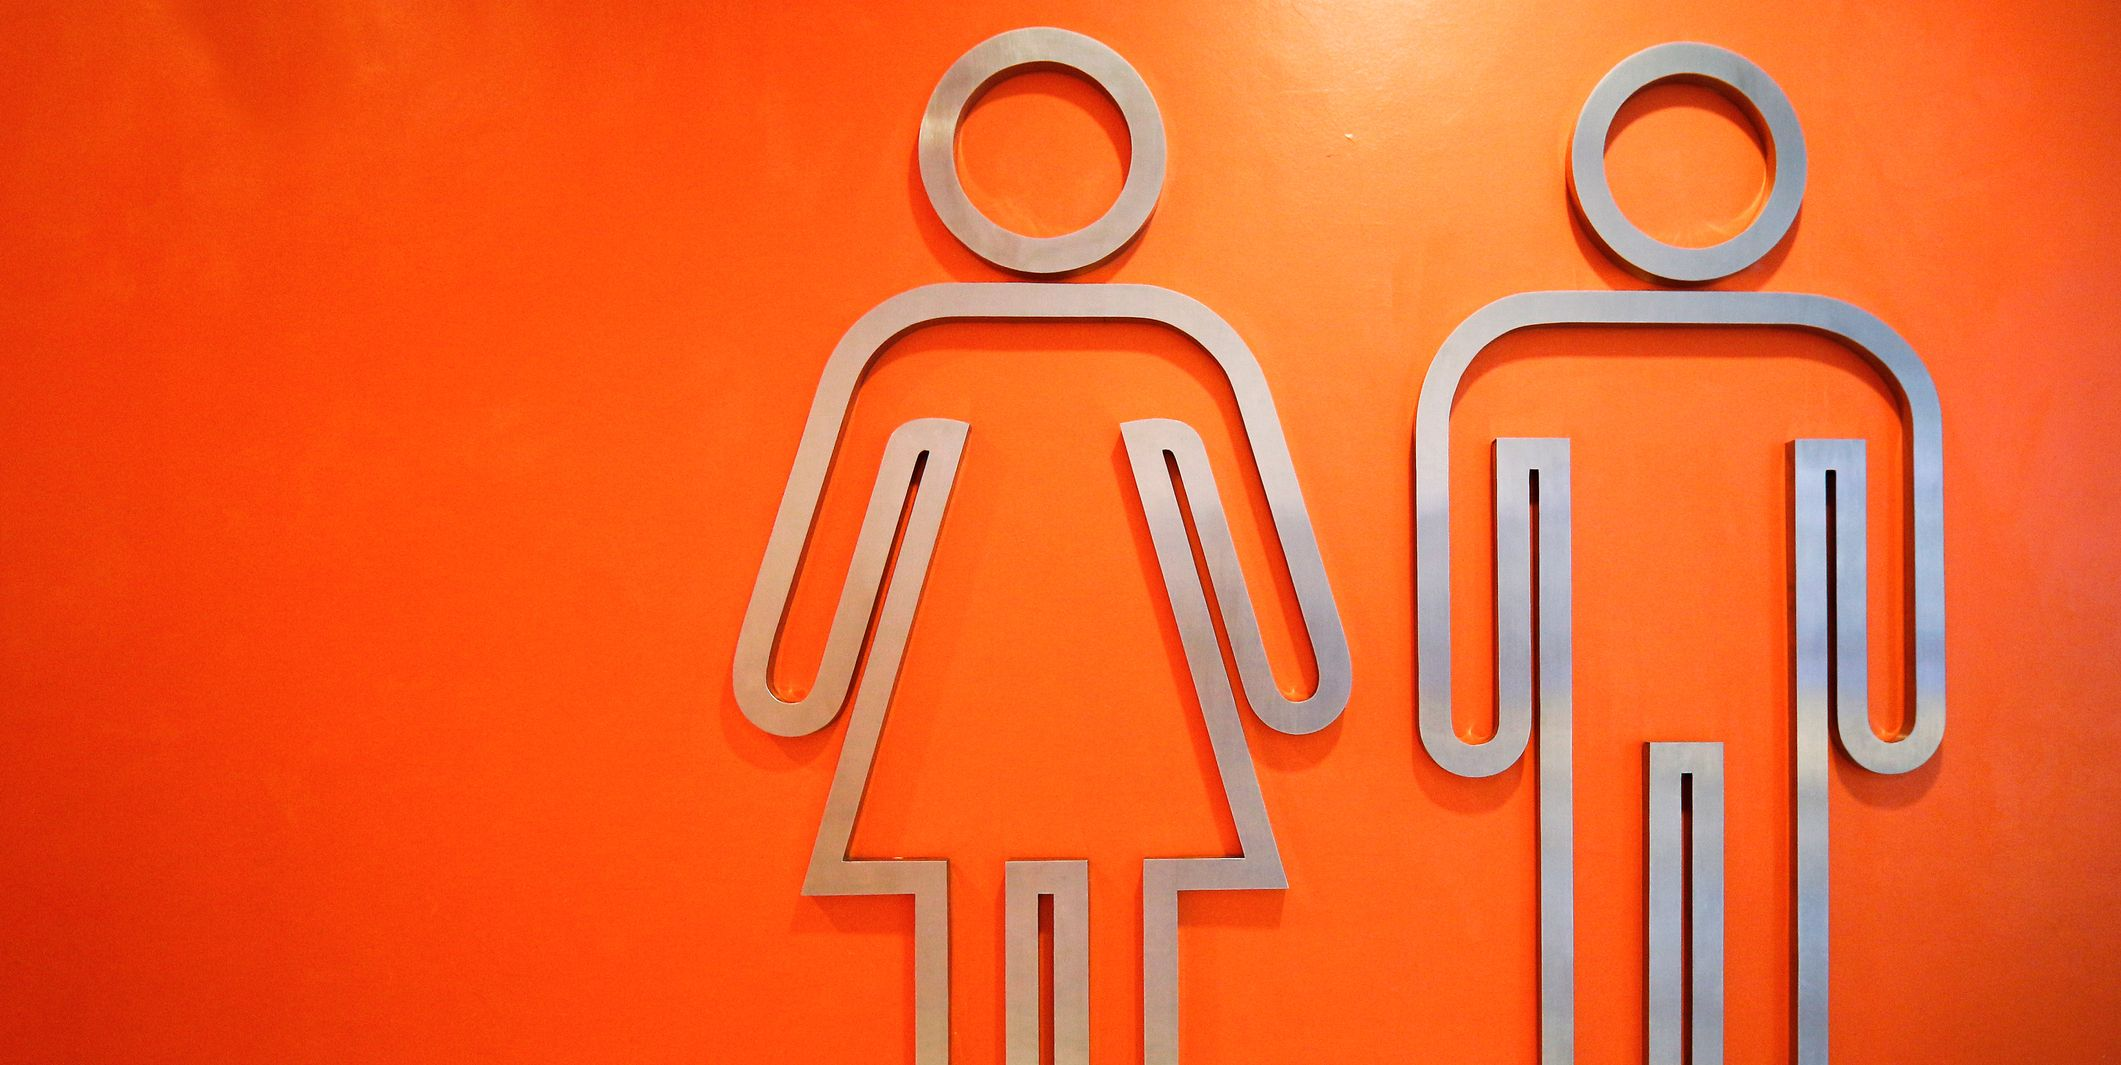 The subtle way most job adverts discriminate against genders